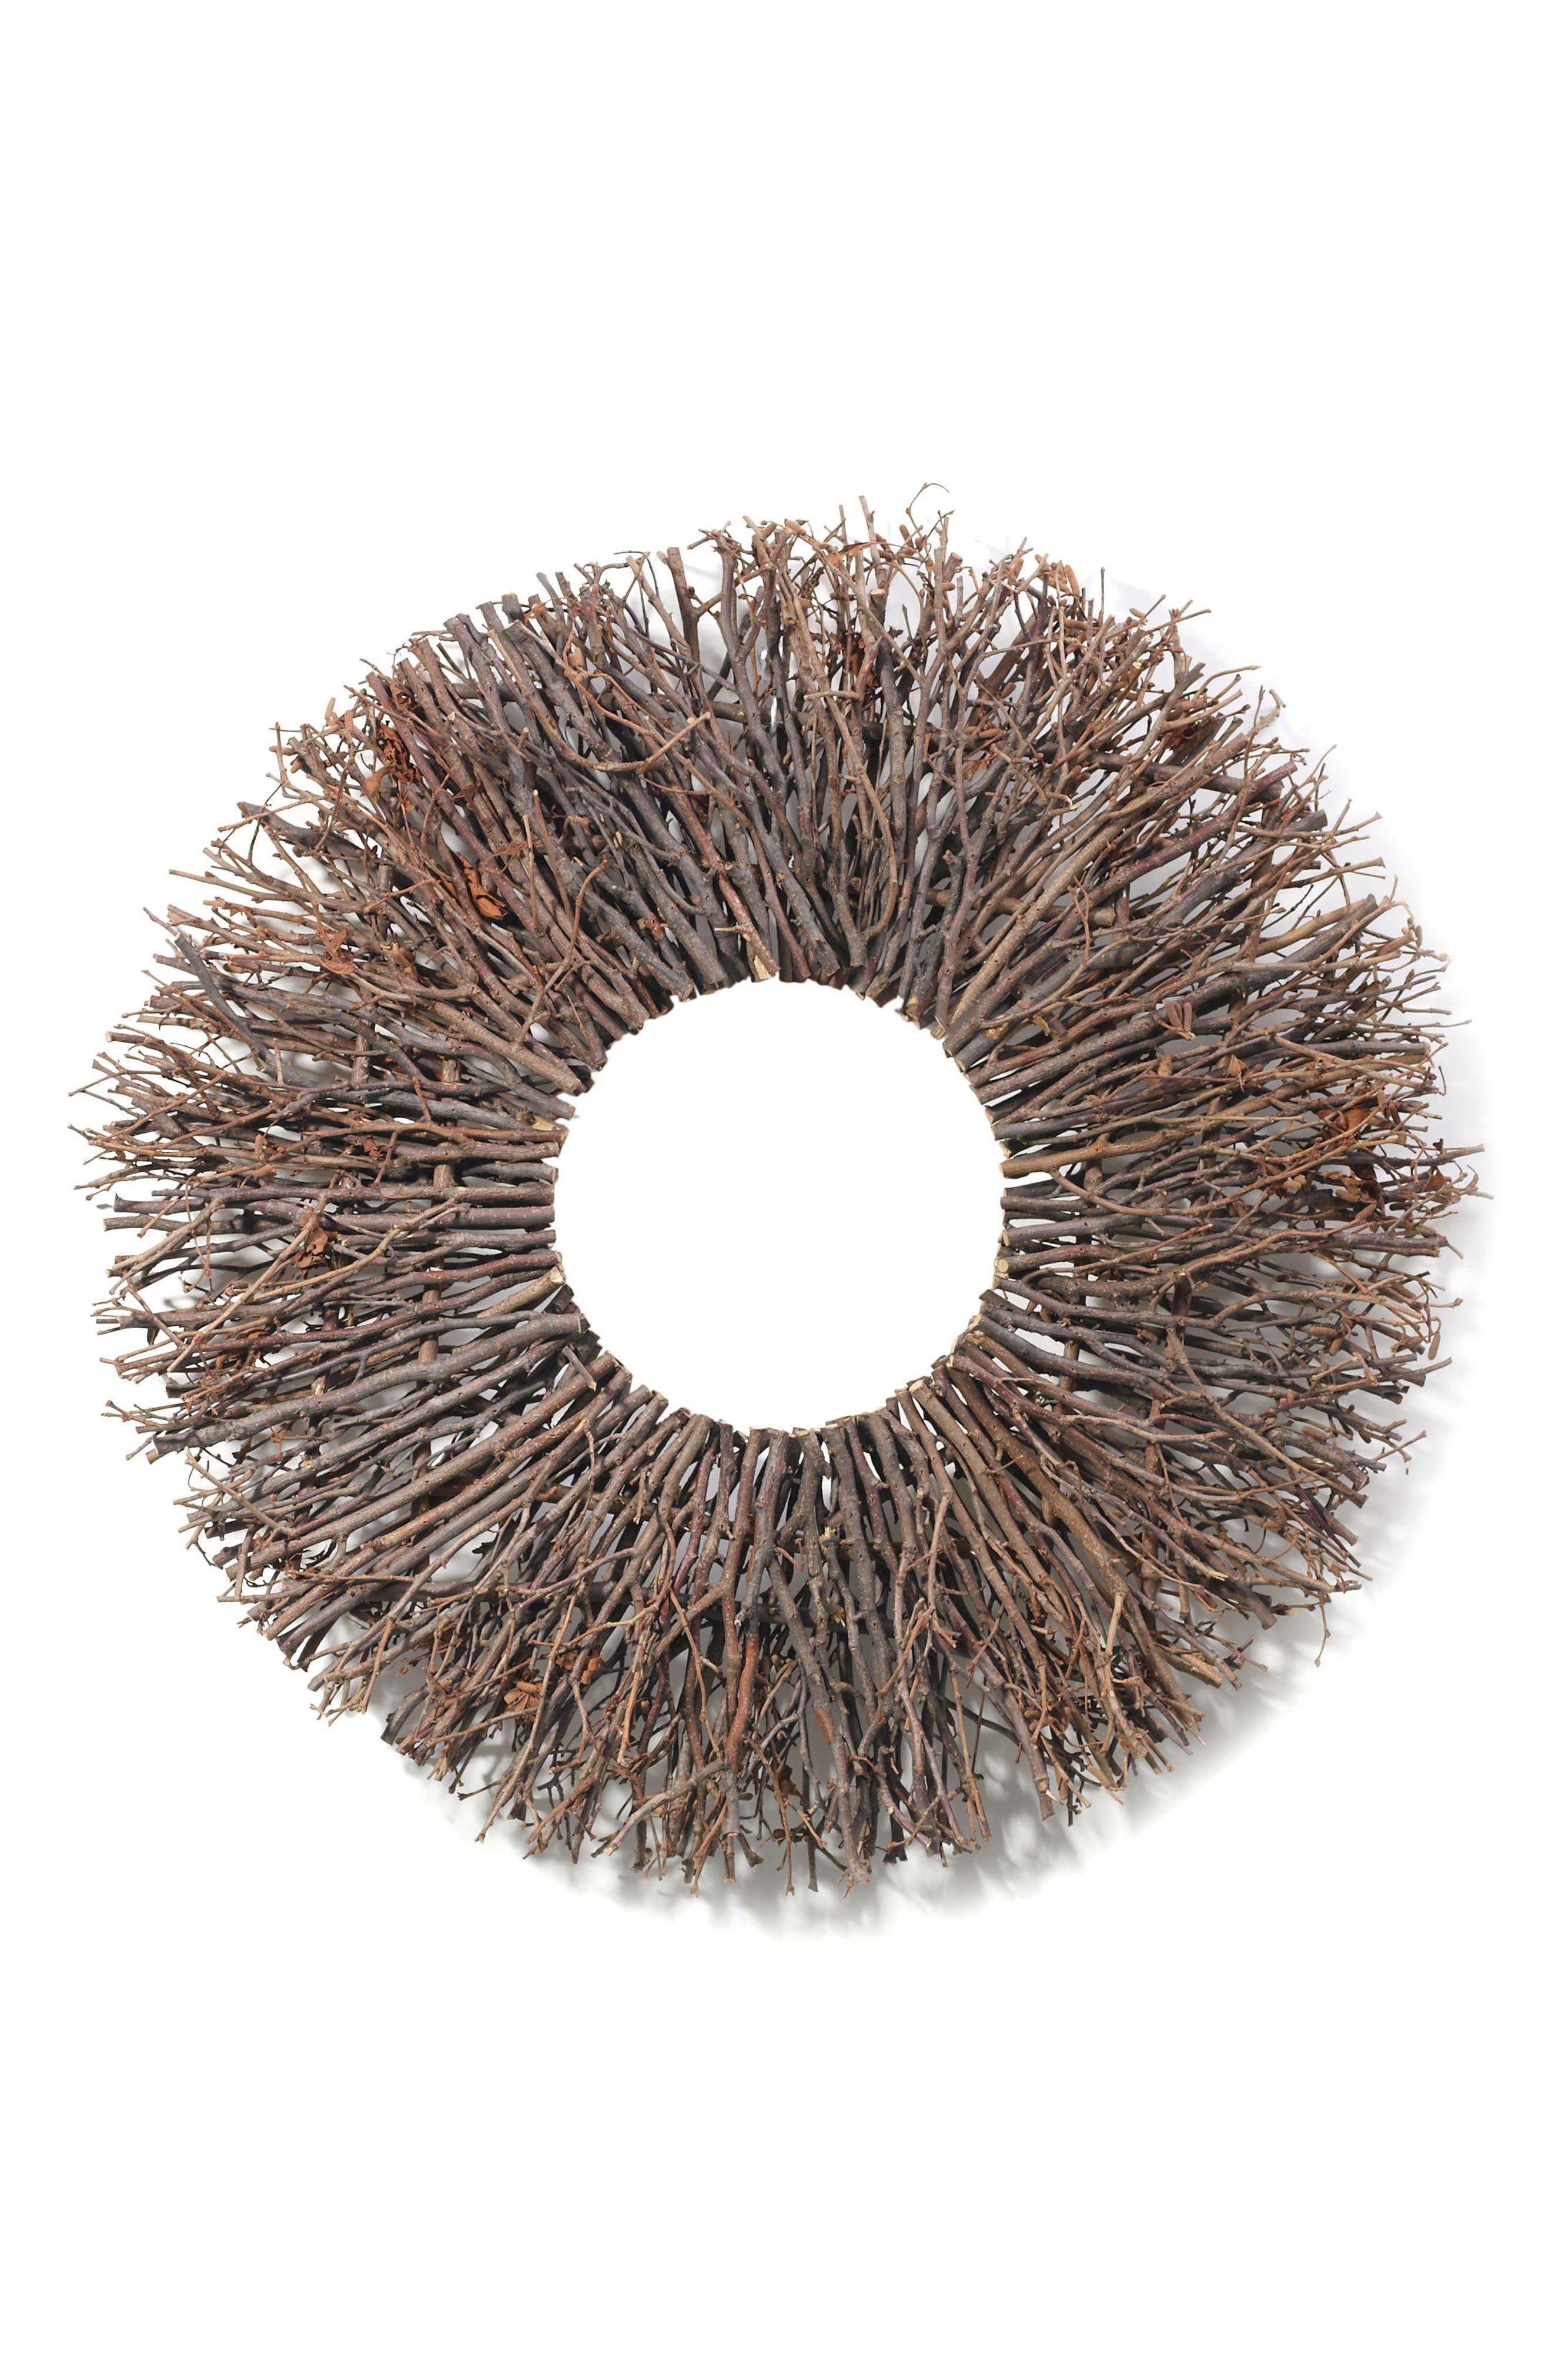 Main Image - Accent Decor Twig Wreath